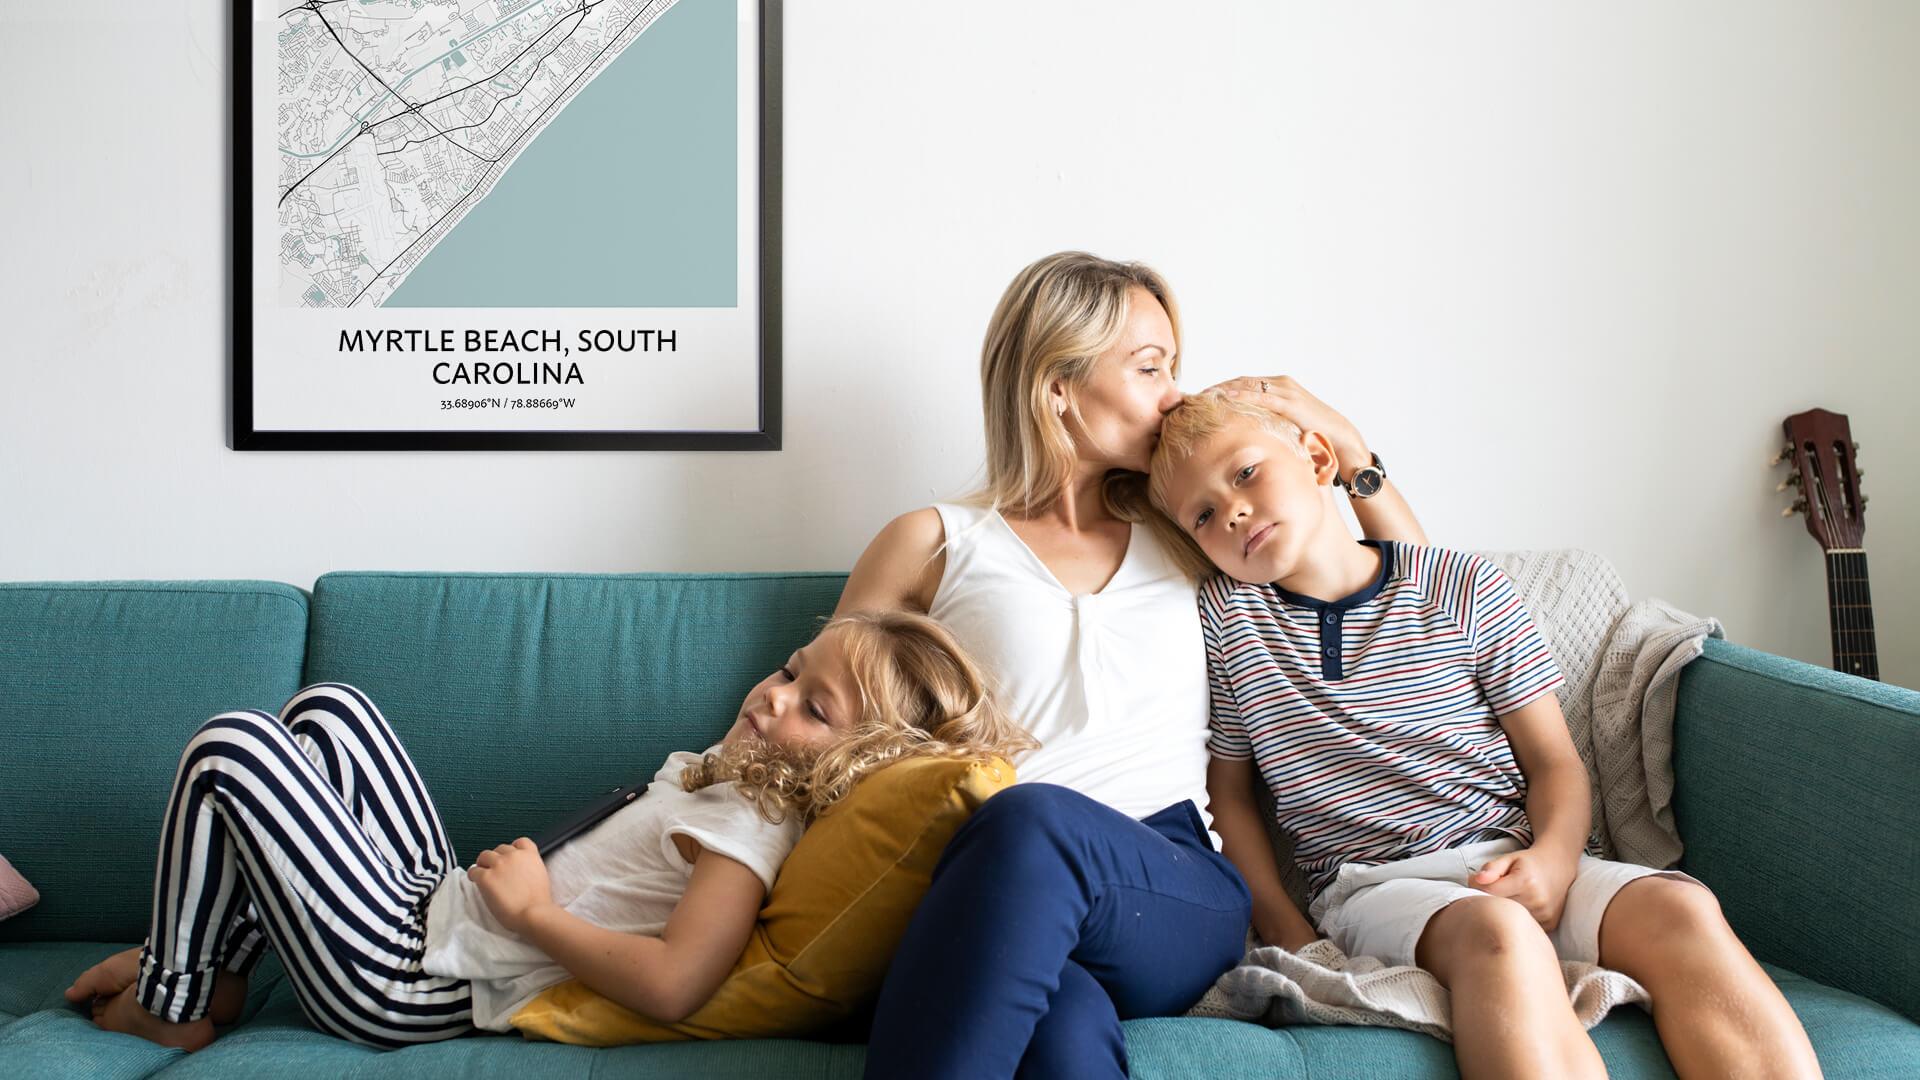 Myrtle Beach map poster